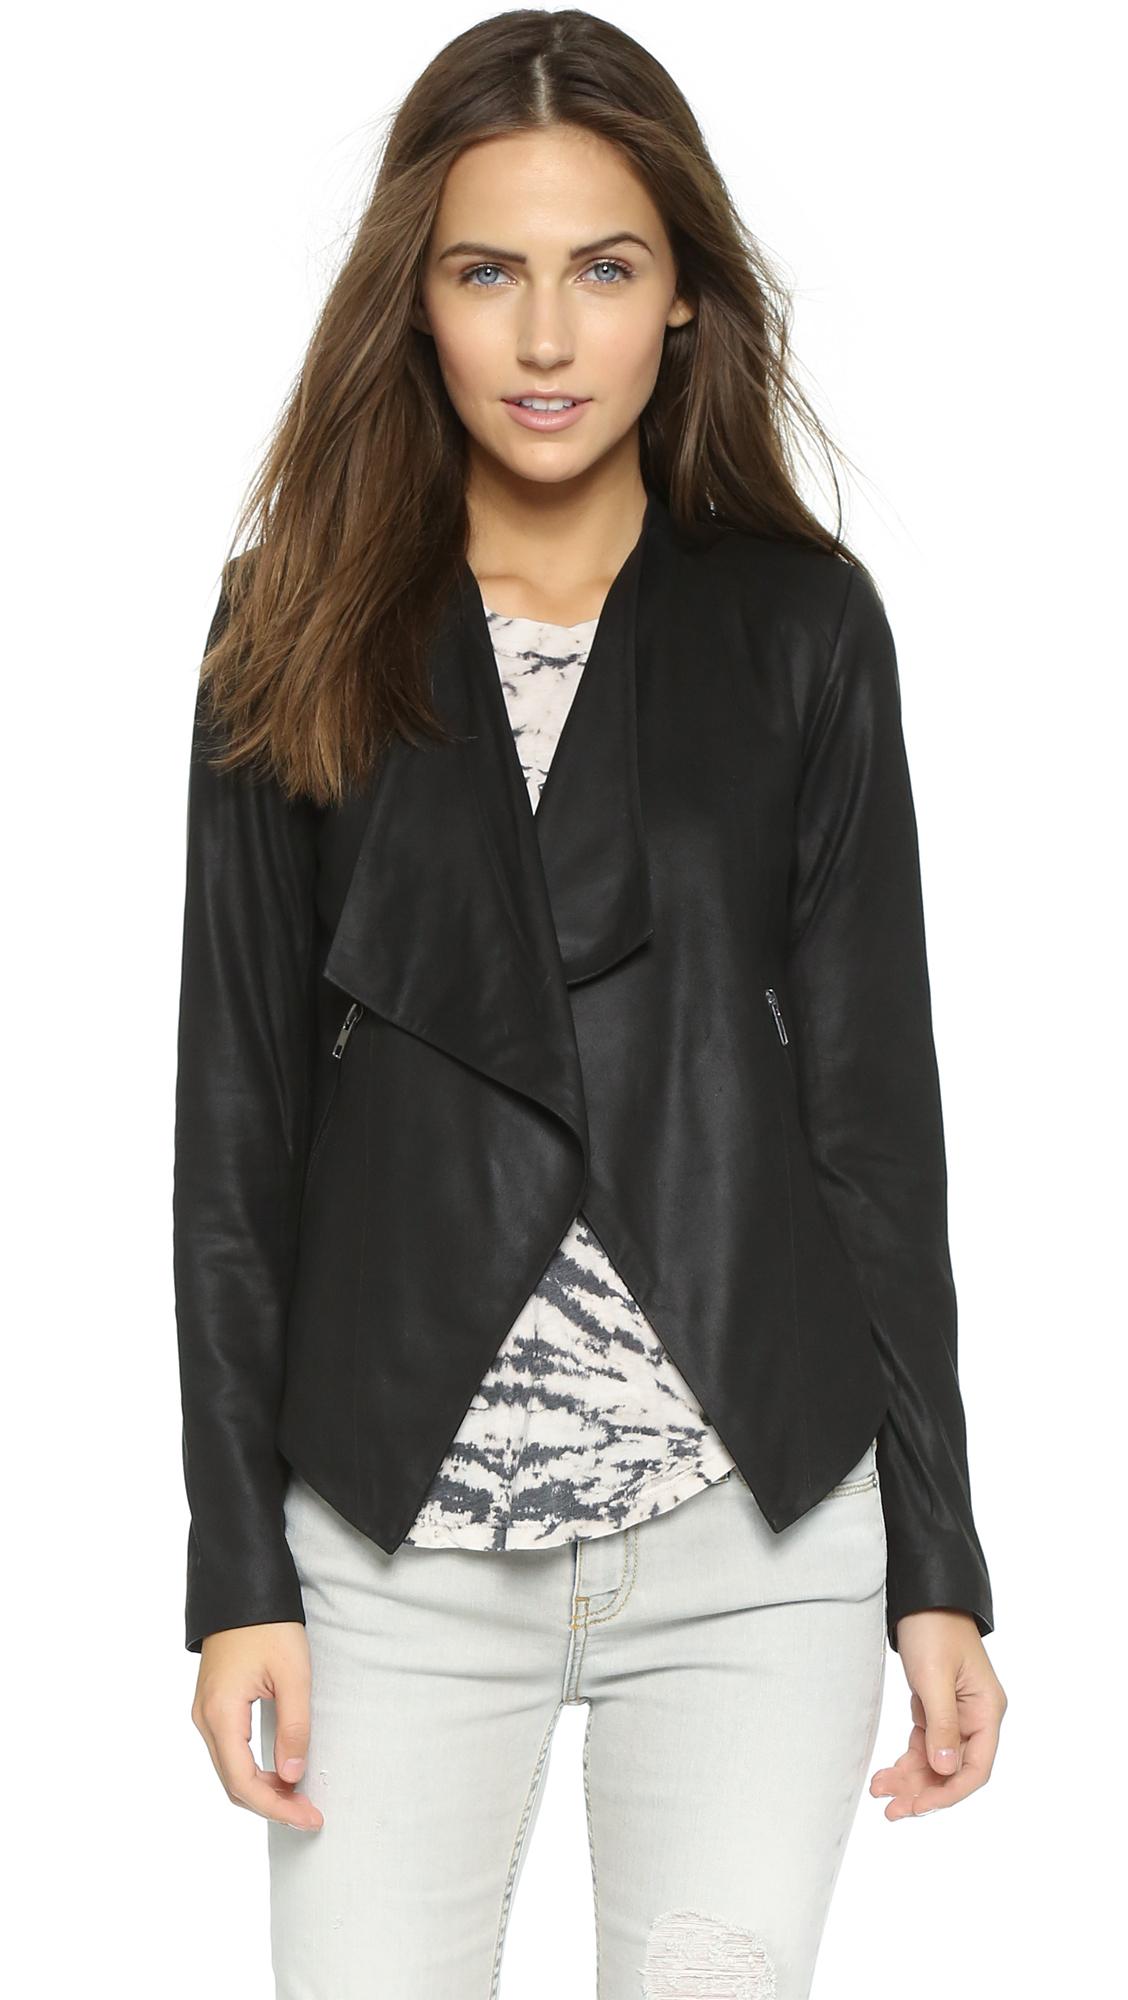 Bb dakota leather jackets